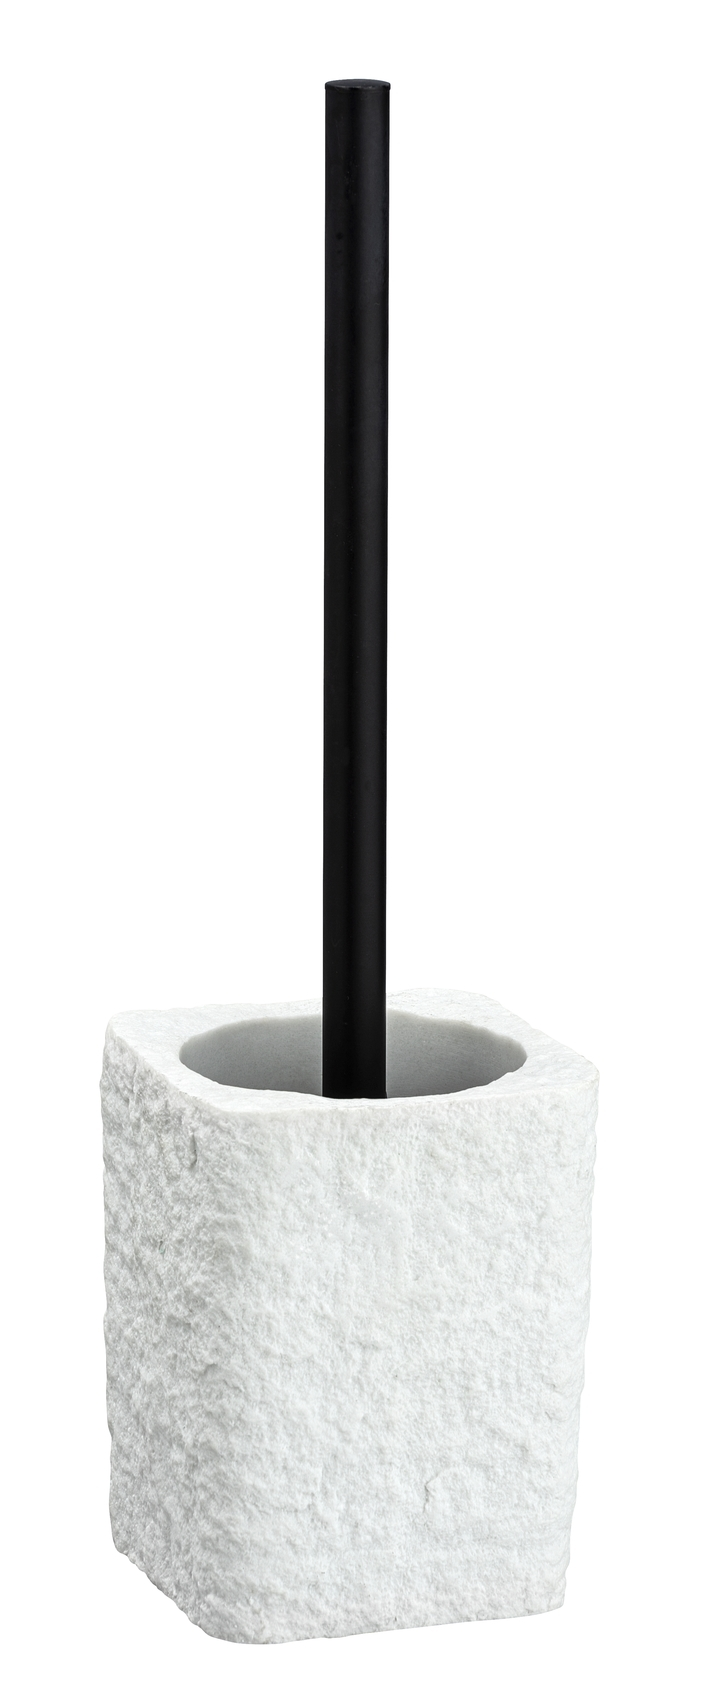 Perie de toaleta cu suport din polirasina, Villata Alb, L11,2xl10xH37 cm imagine